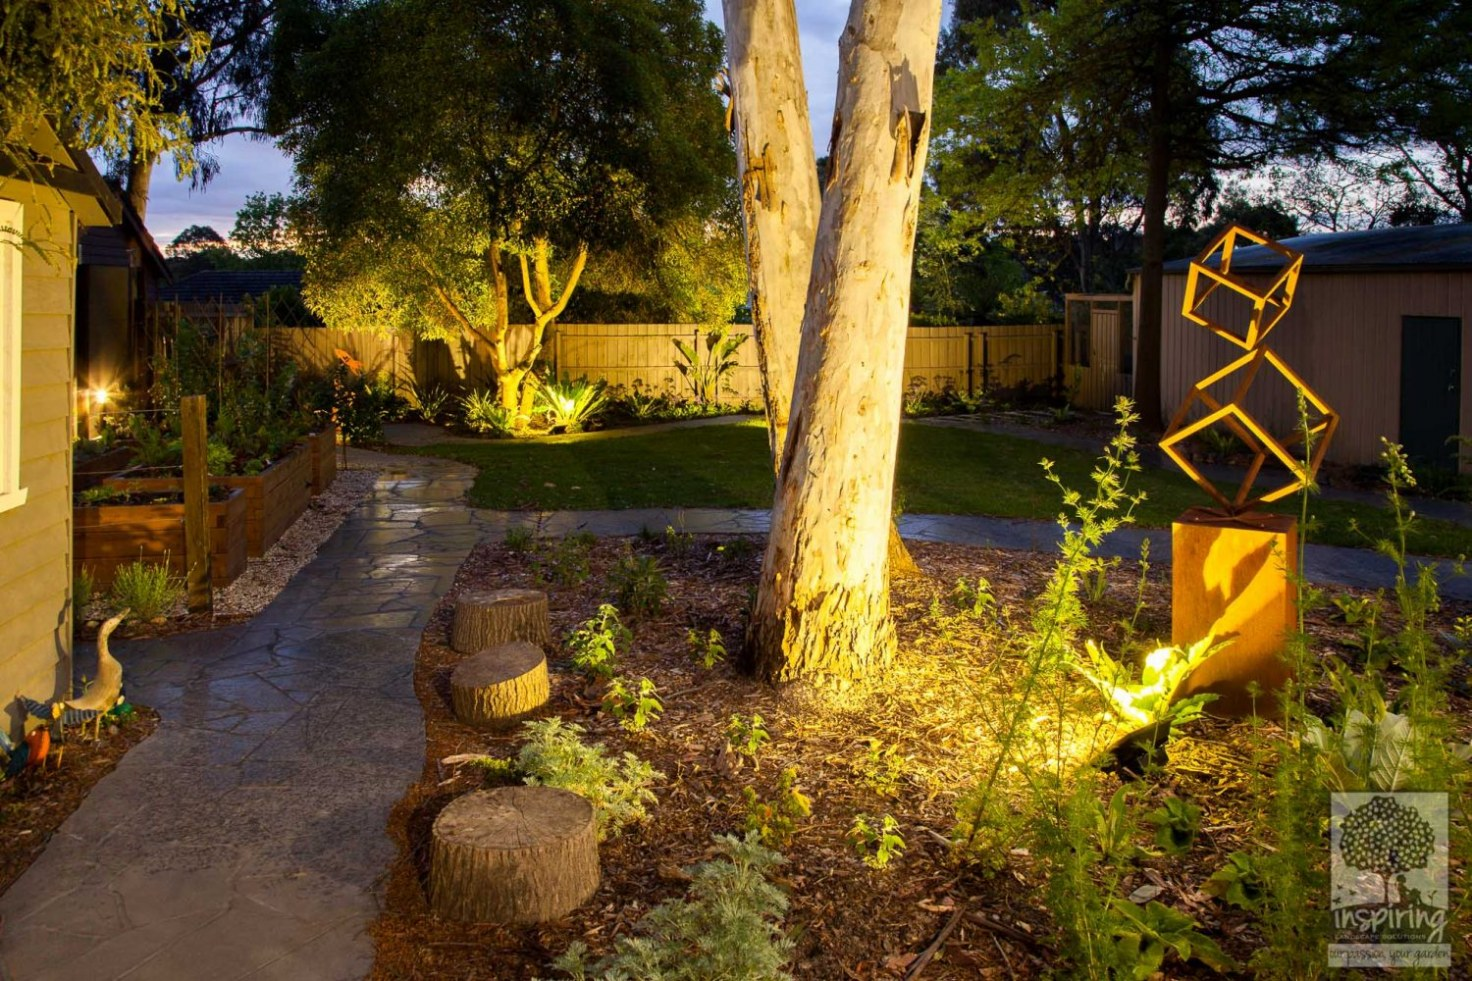 View of Blackburn backyard garden lit up at night